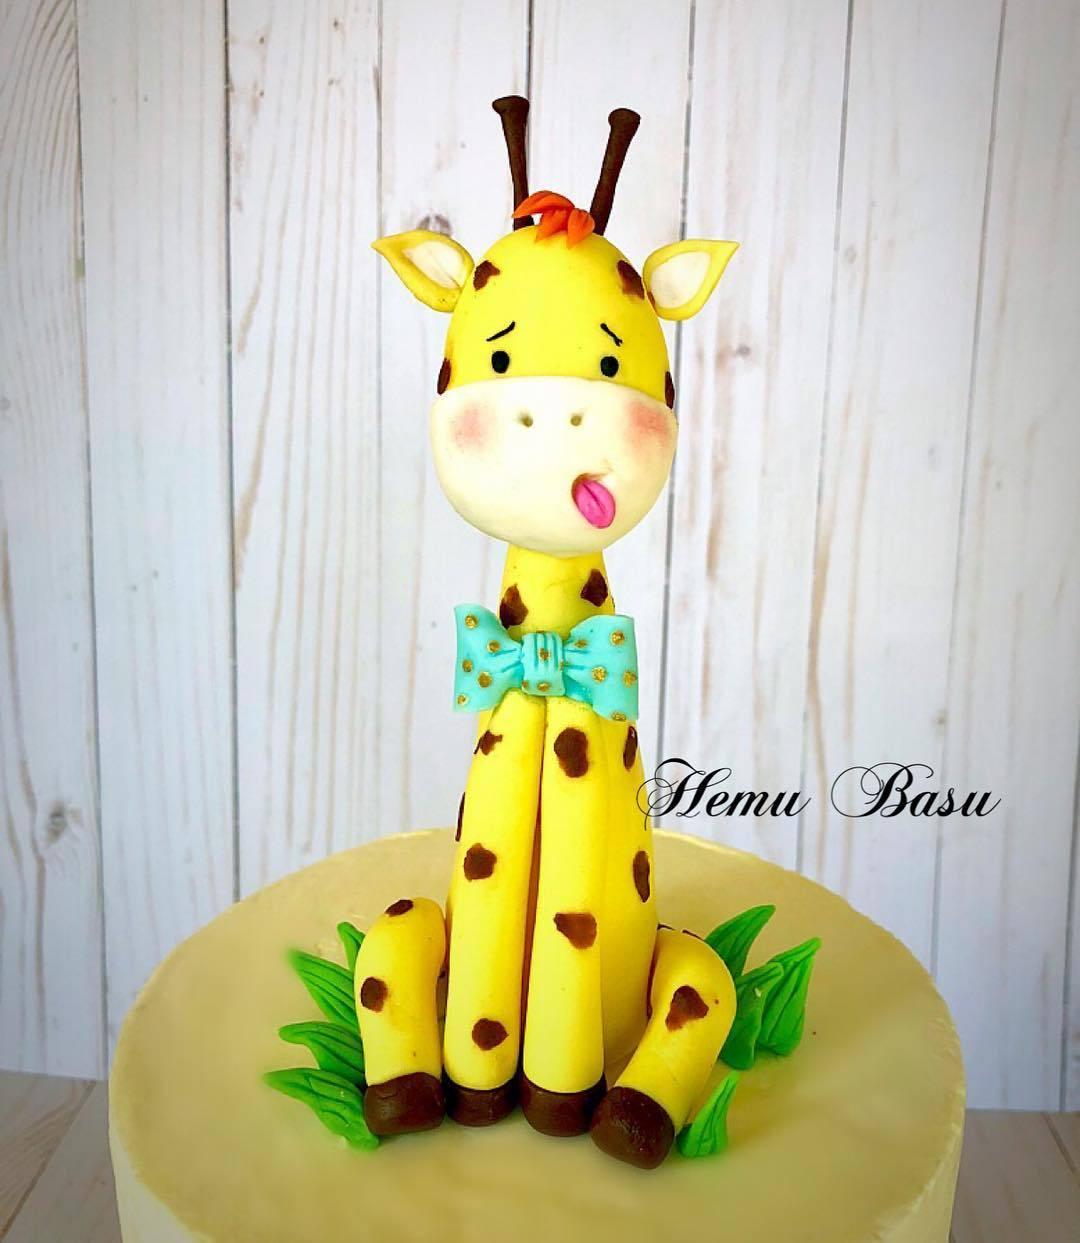 Choco Pan Hemu Basu The Sweet Sensation Novelty 10 A